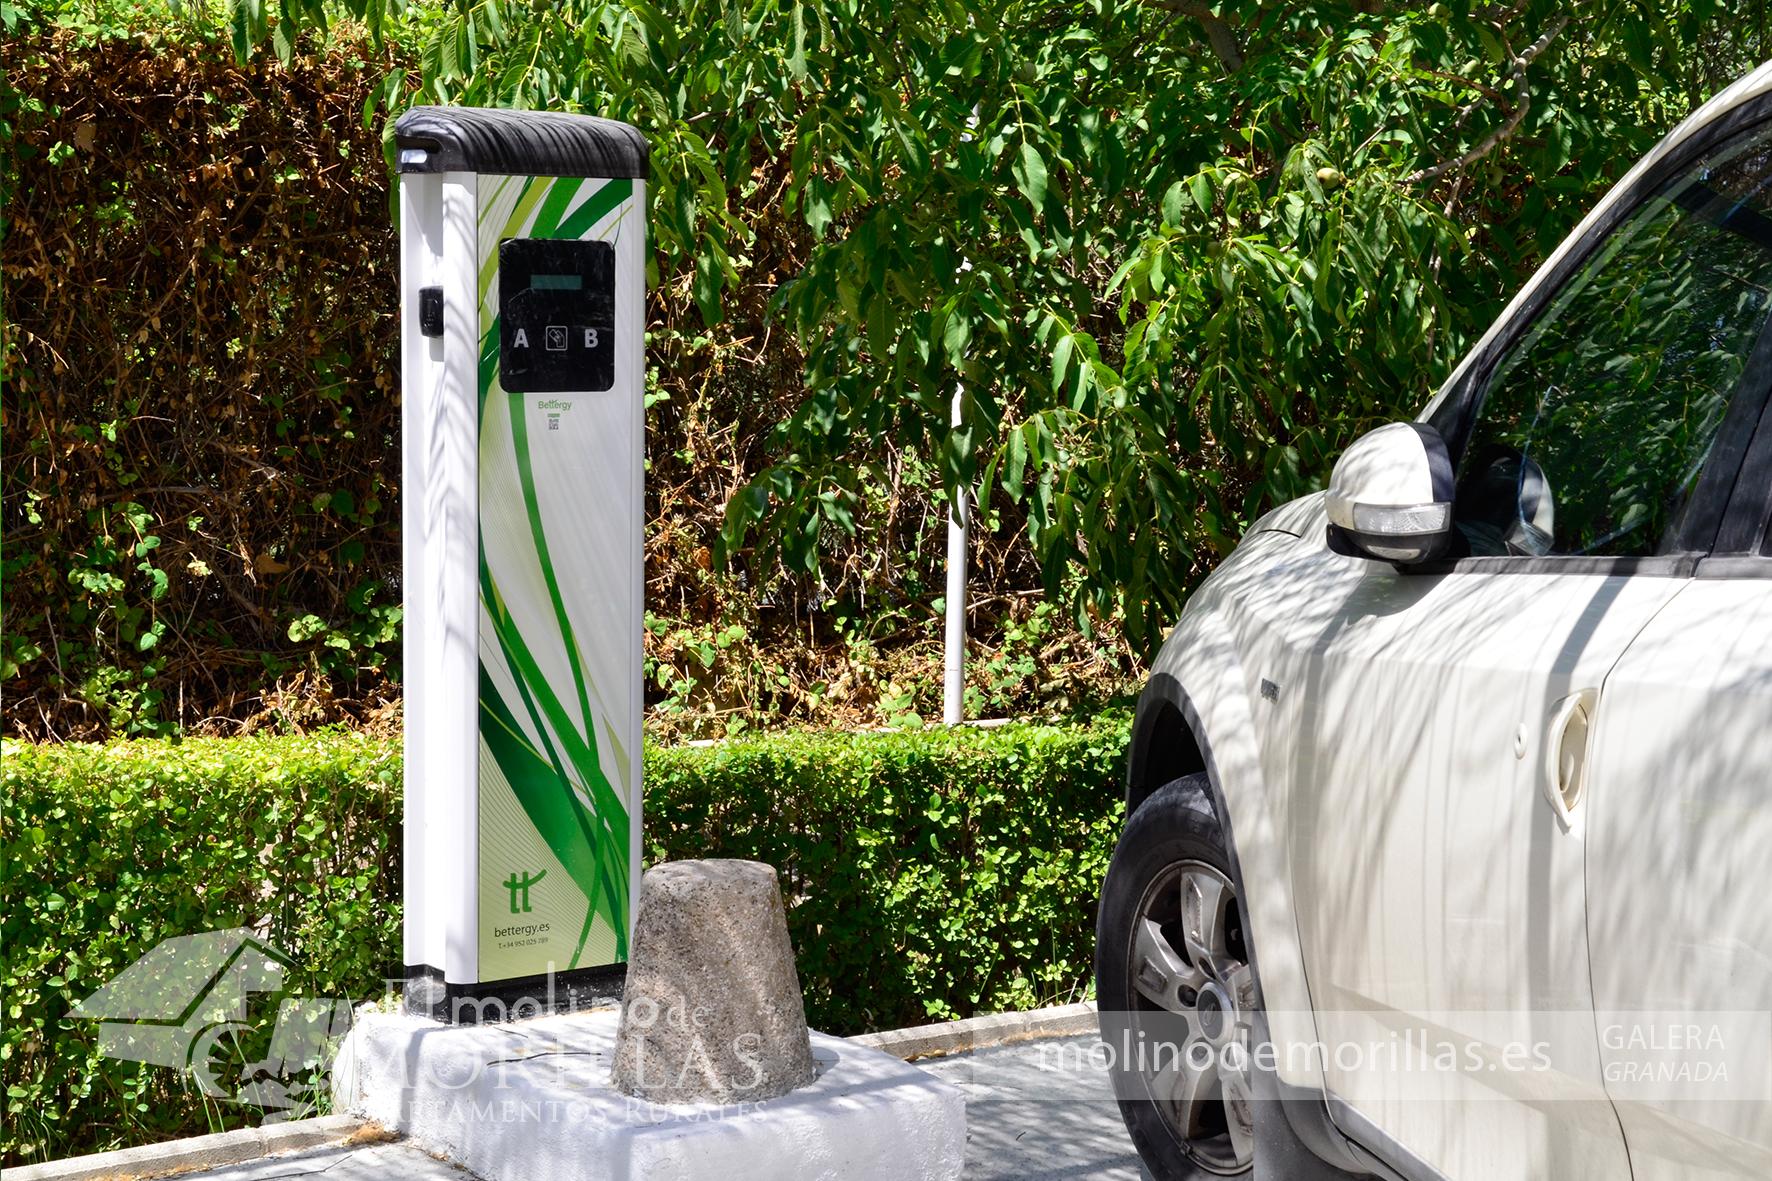 Punto recarga para vehículos eléctricos